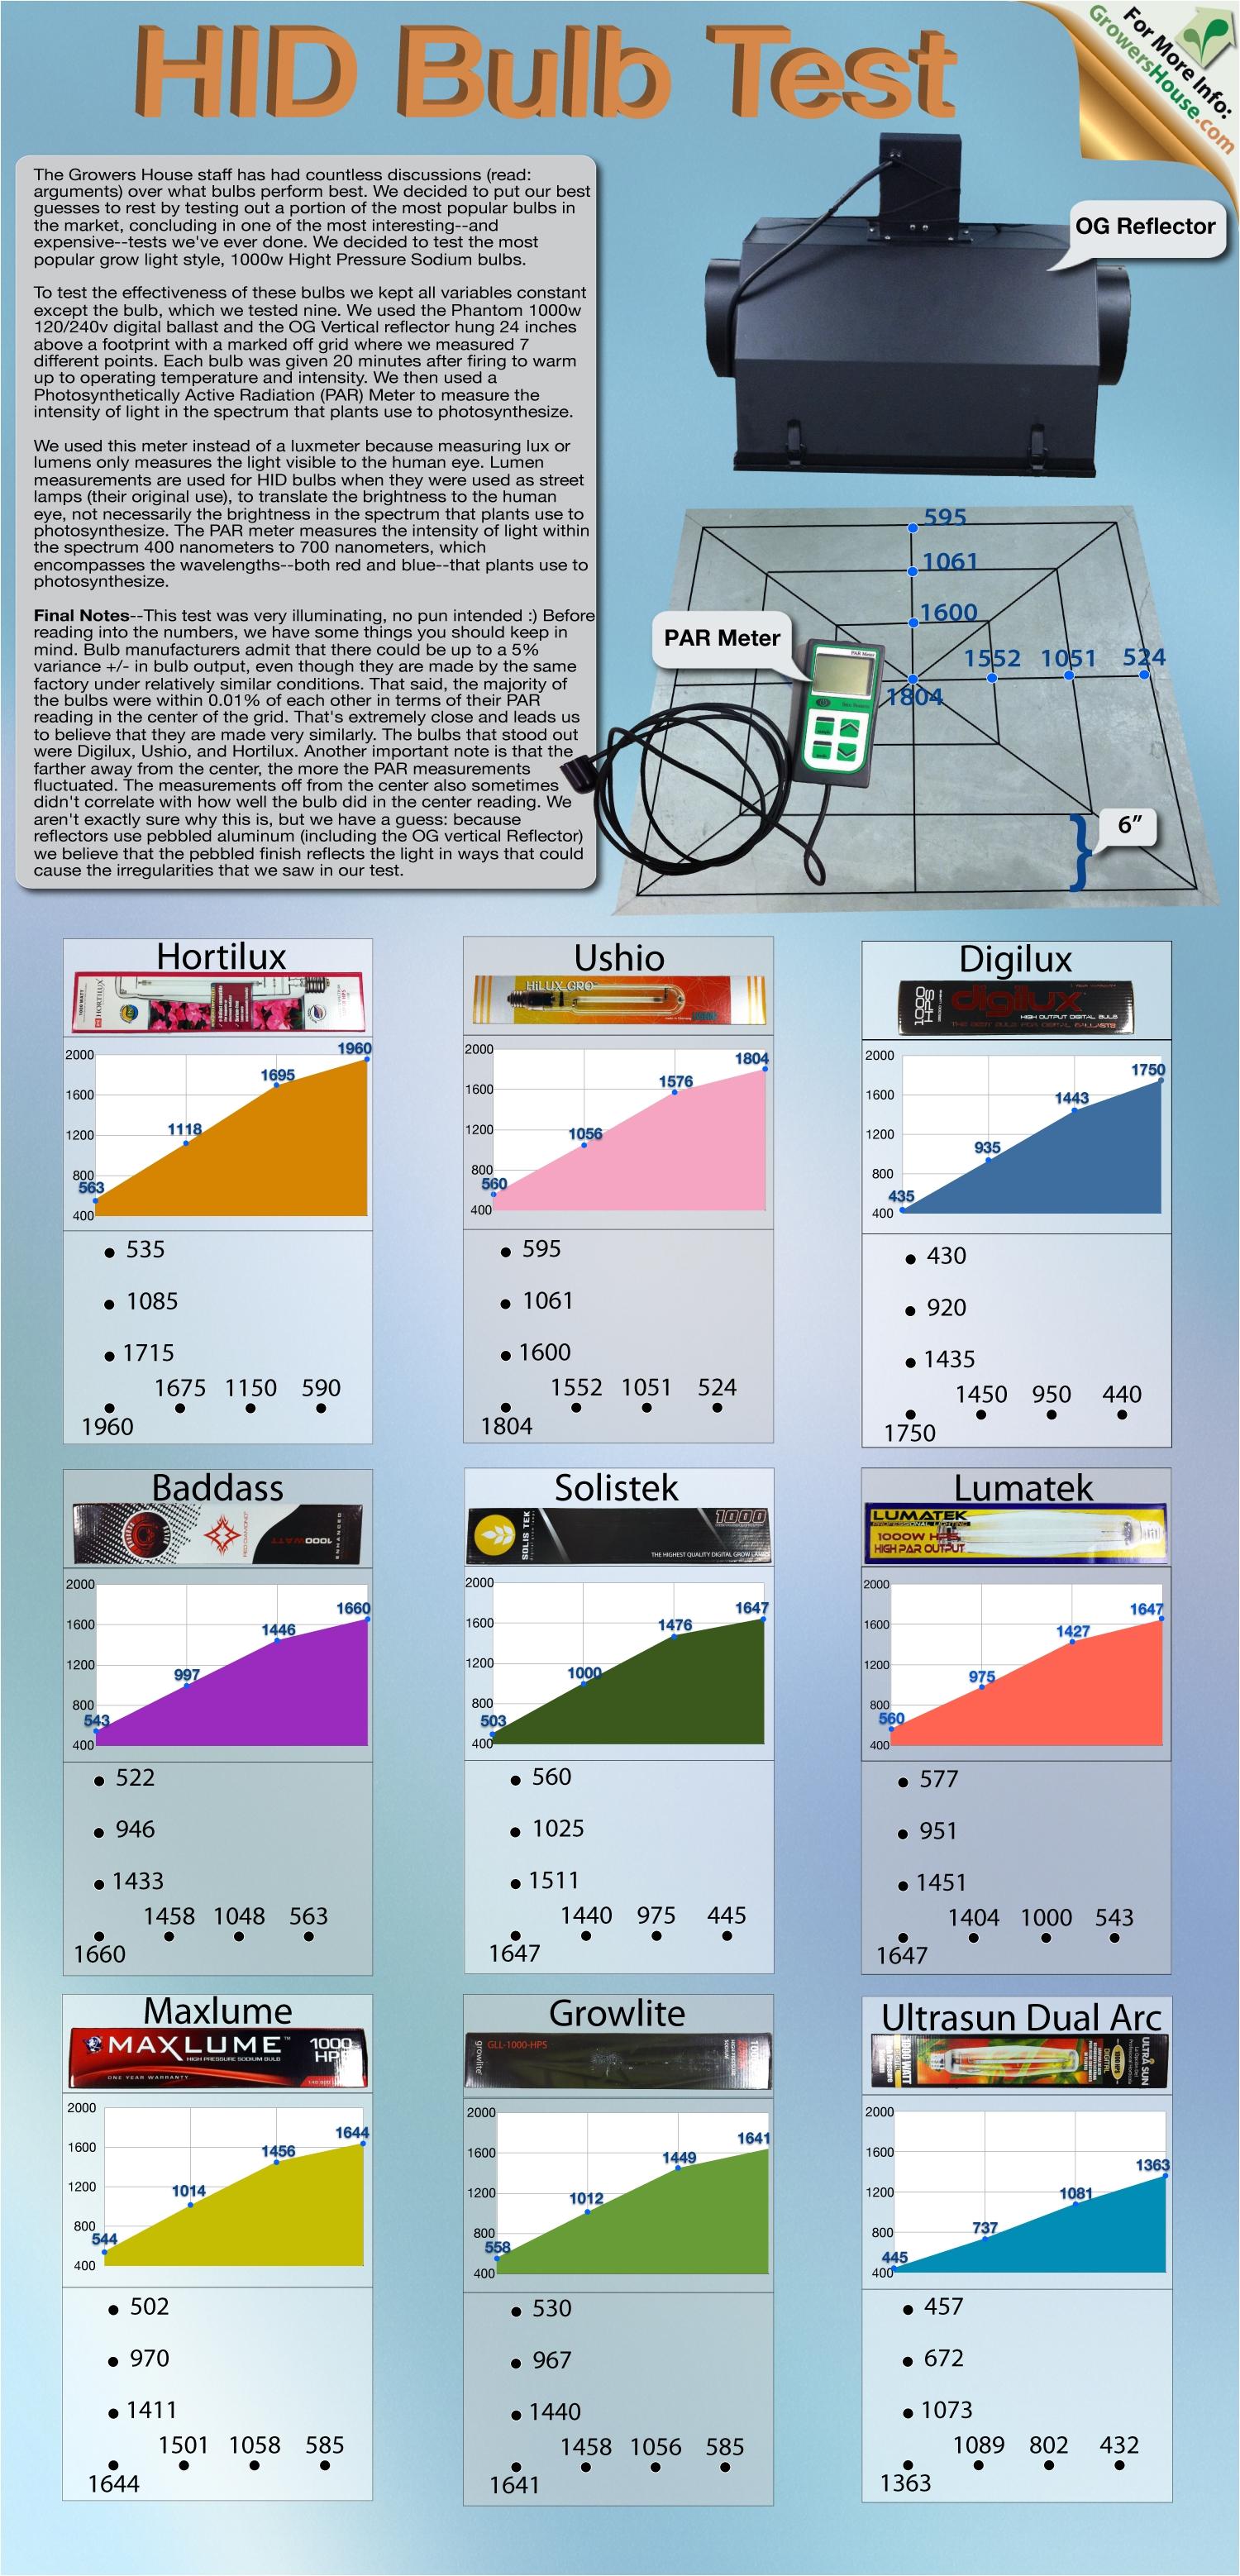 hid bulb test comparison review hortilux ushio digilux baddass solistek lumatek maxlume growlite ultra sun growers house review lab